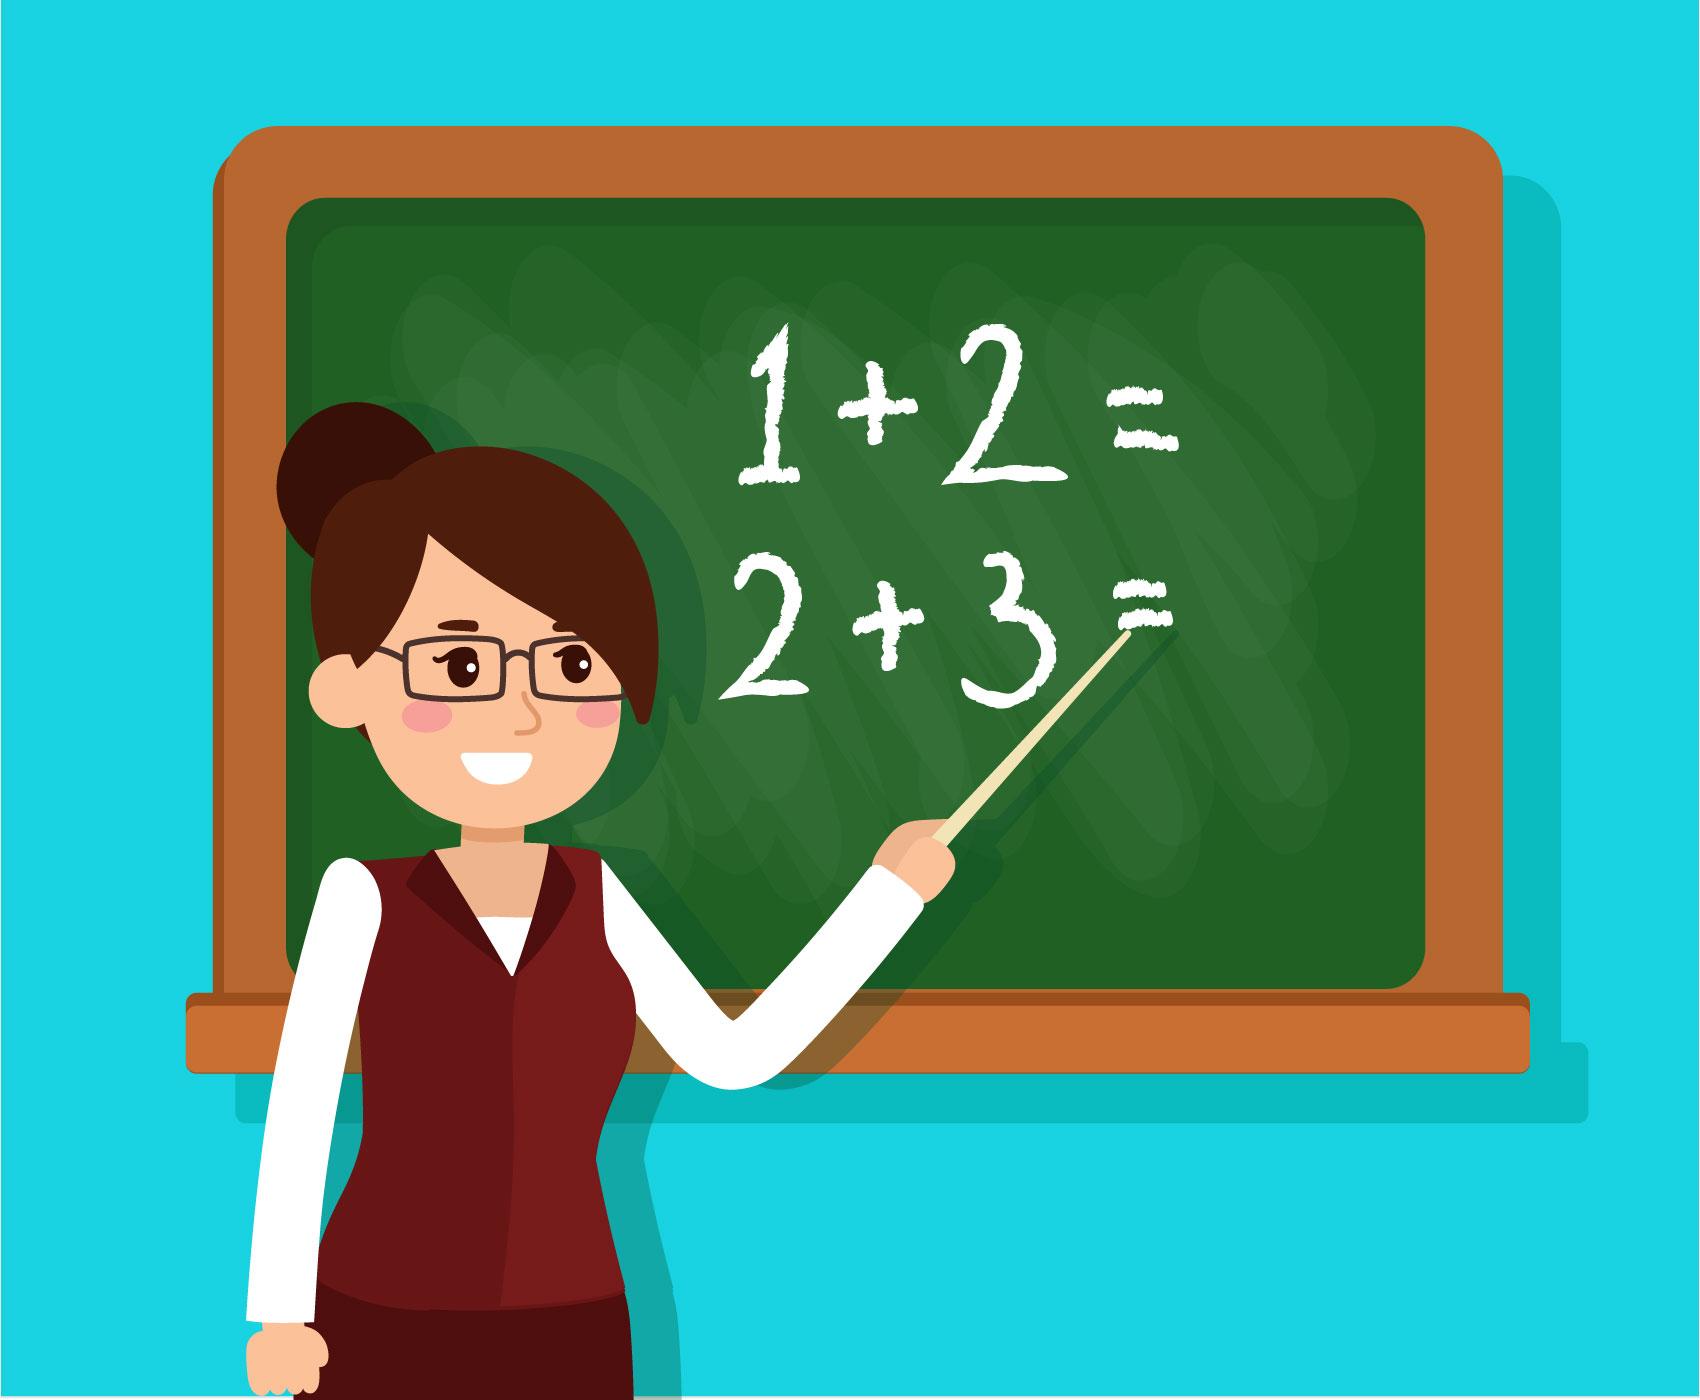 Teacher Teaching Math In a Classroom - Download Free ...